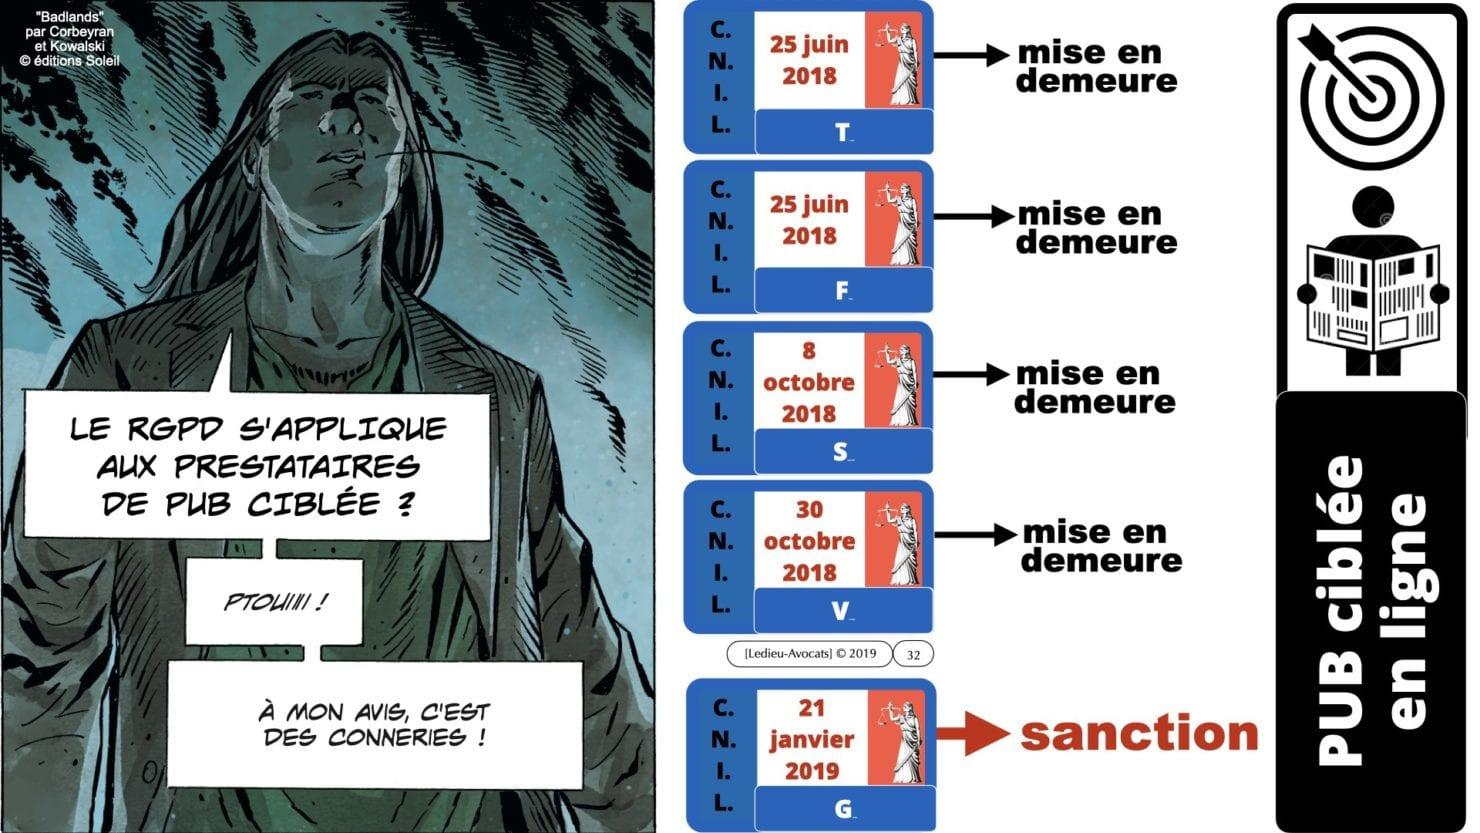 RGPD e-Privacy principes actualité jurisprudence ©Ledieu-Avocats 25-06-2021.032